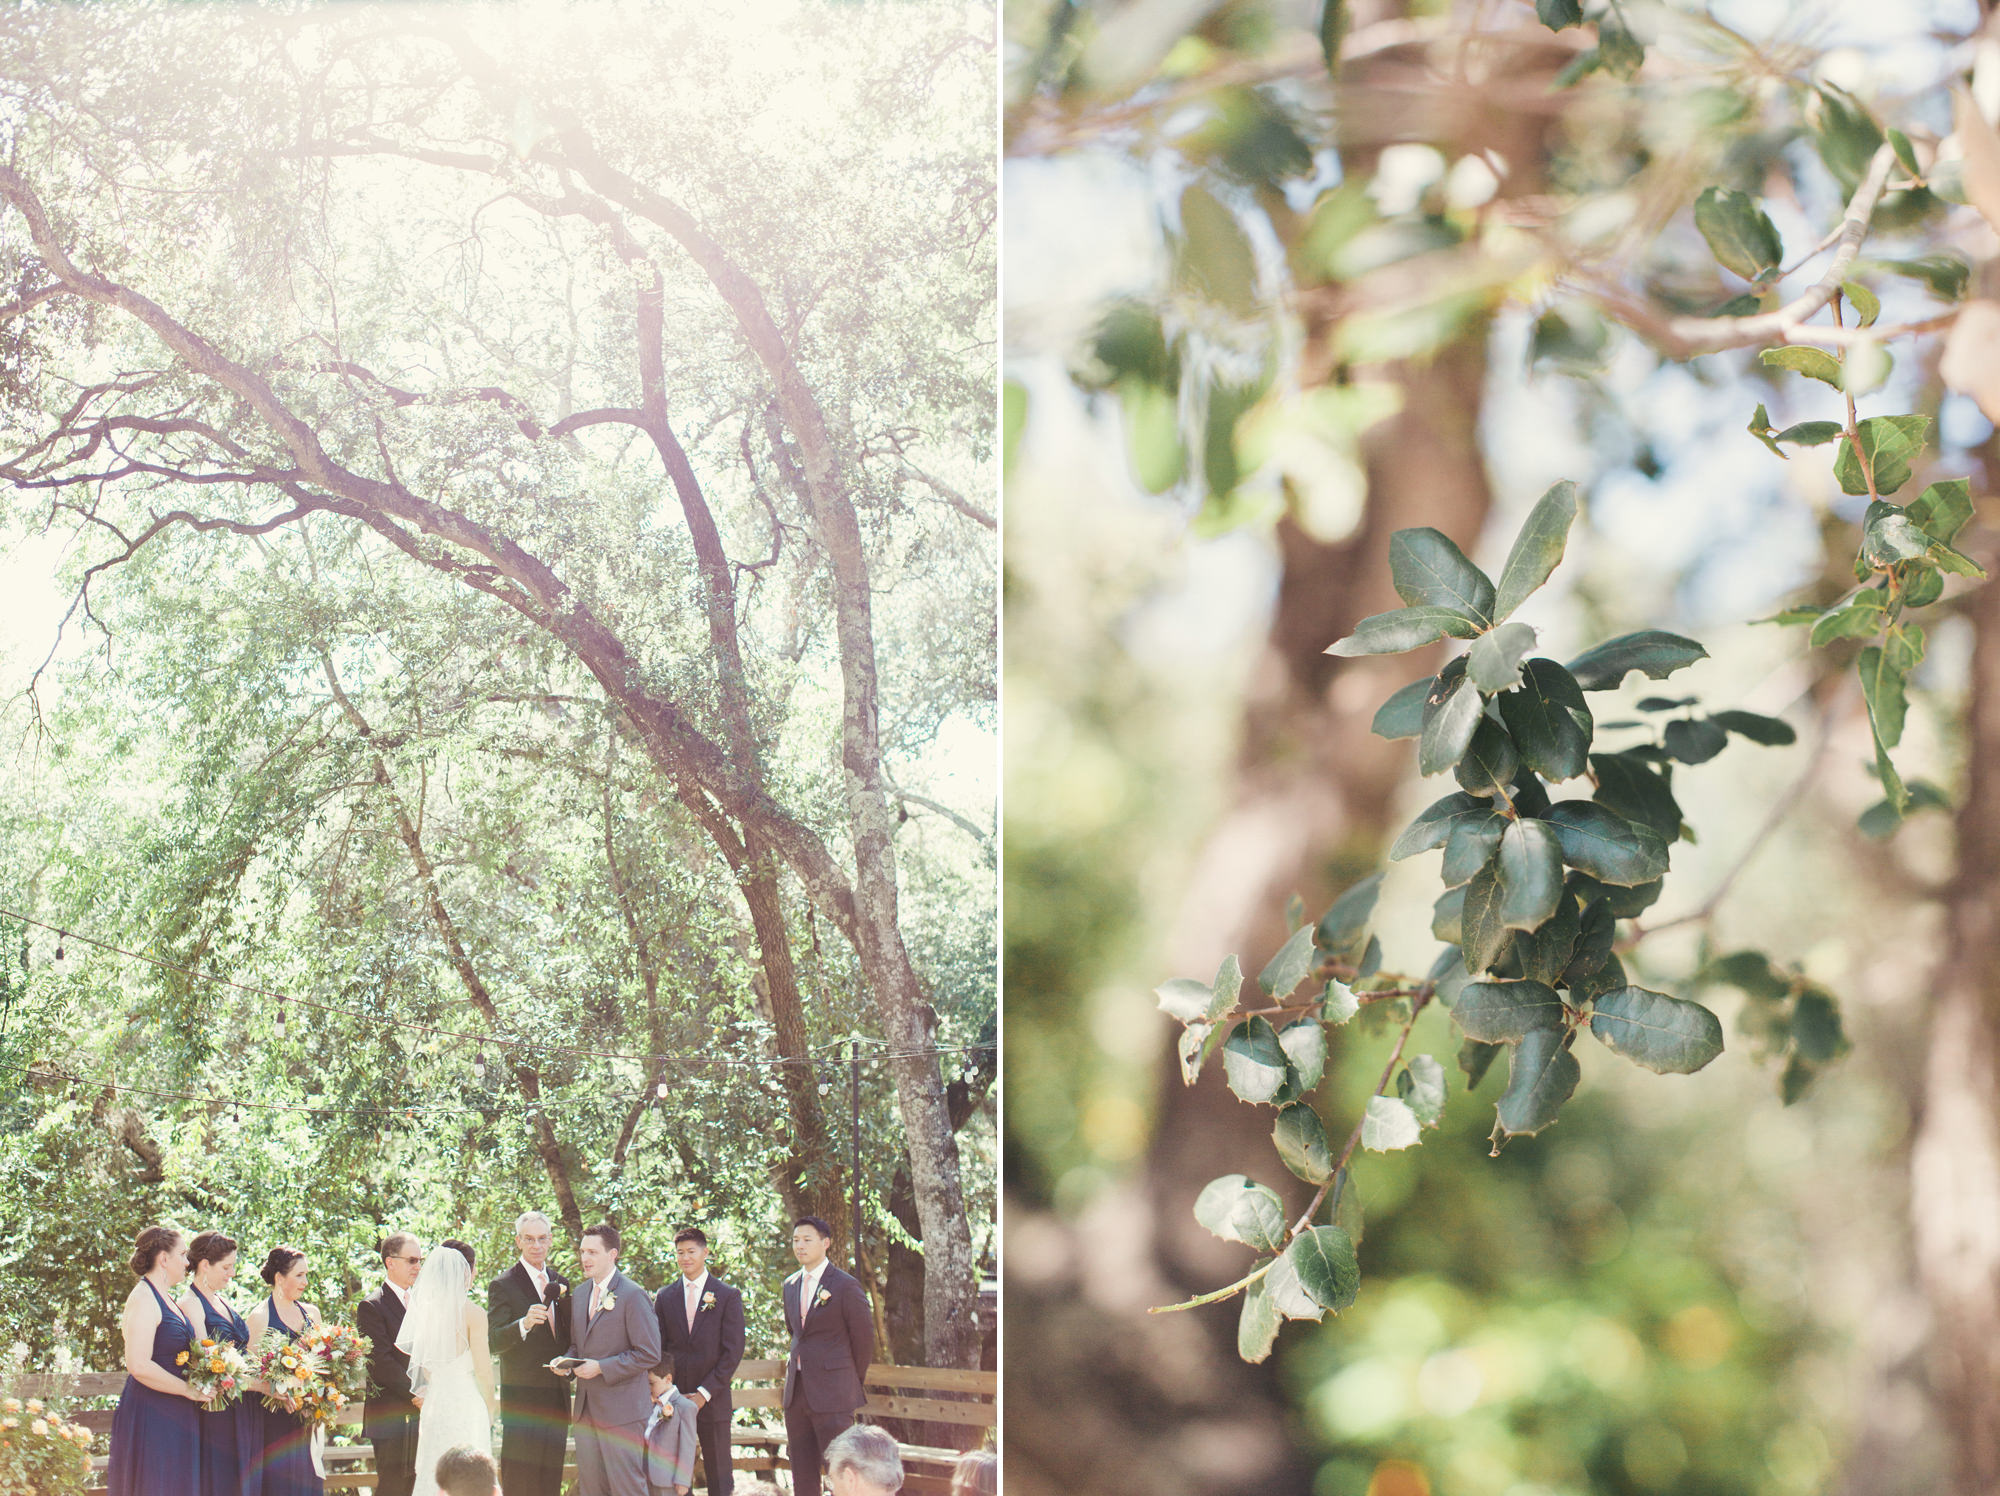 Backyard Wedding in California©Anne-Claire Brun 0014